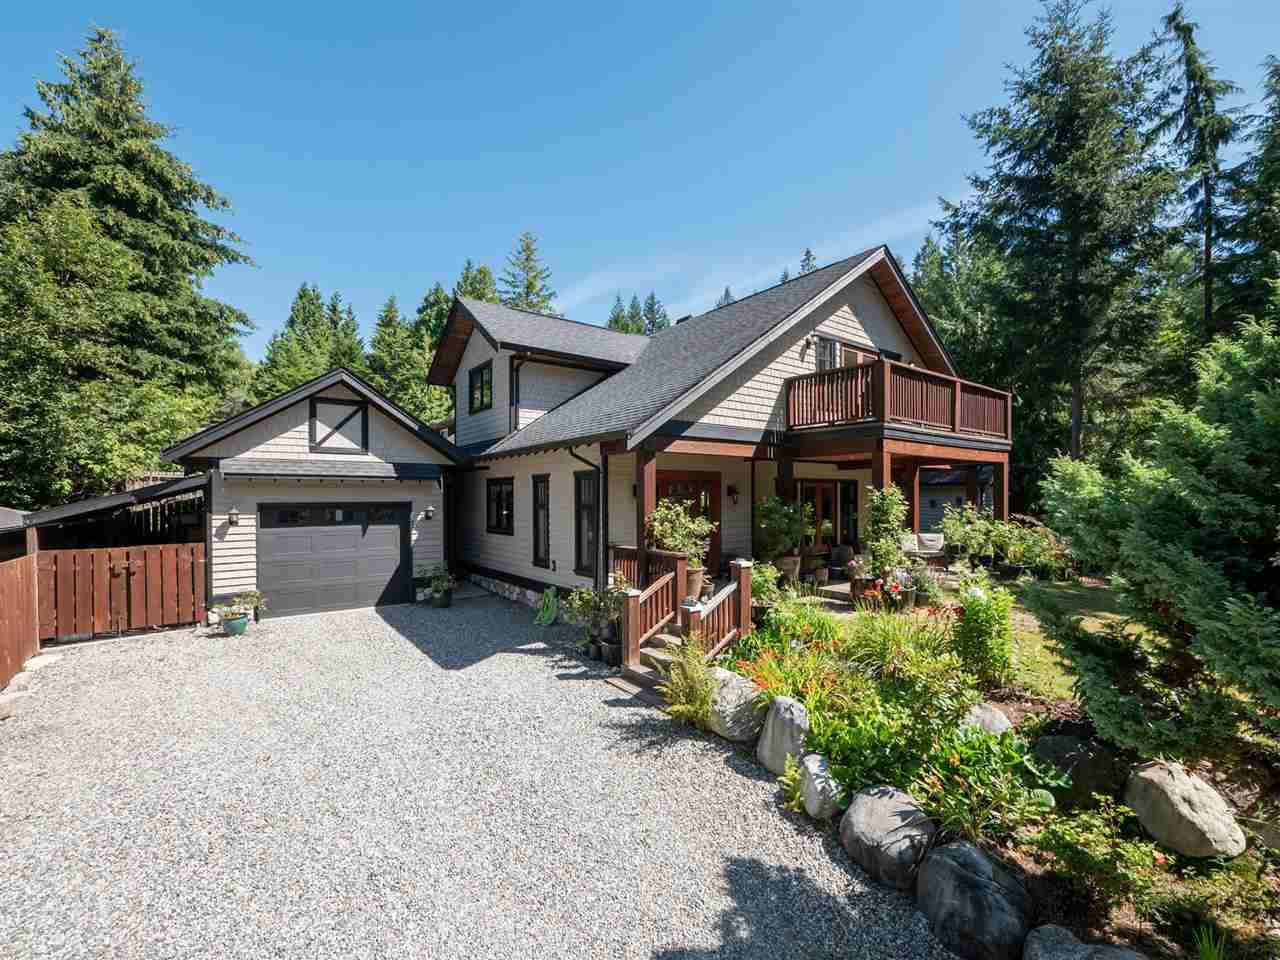 Main Photo: 1453 PARK Avenue: Roberts Creek House for sale (Sunshine Coast)  : MLS®# R2480704